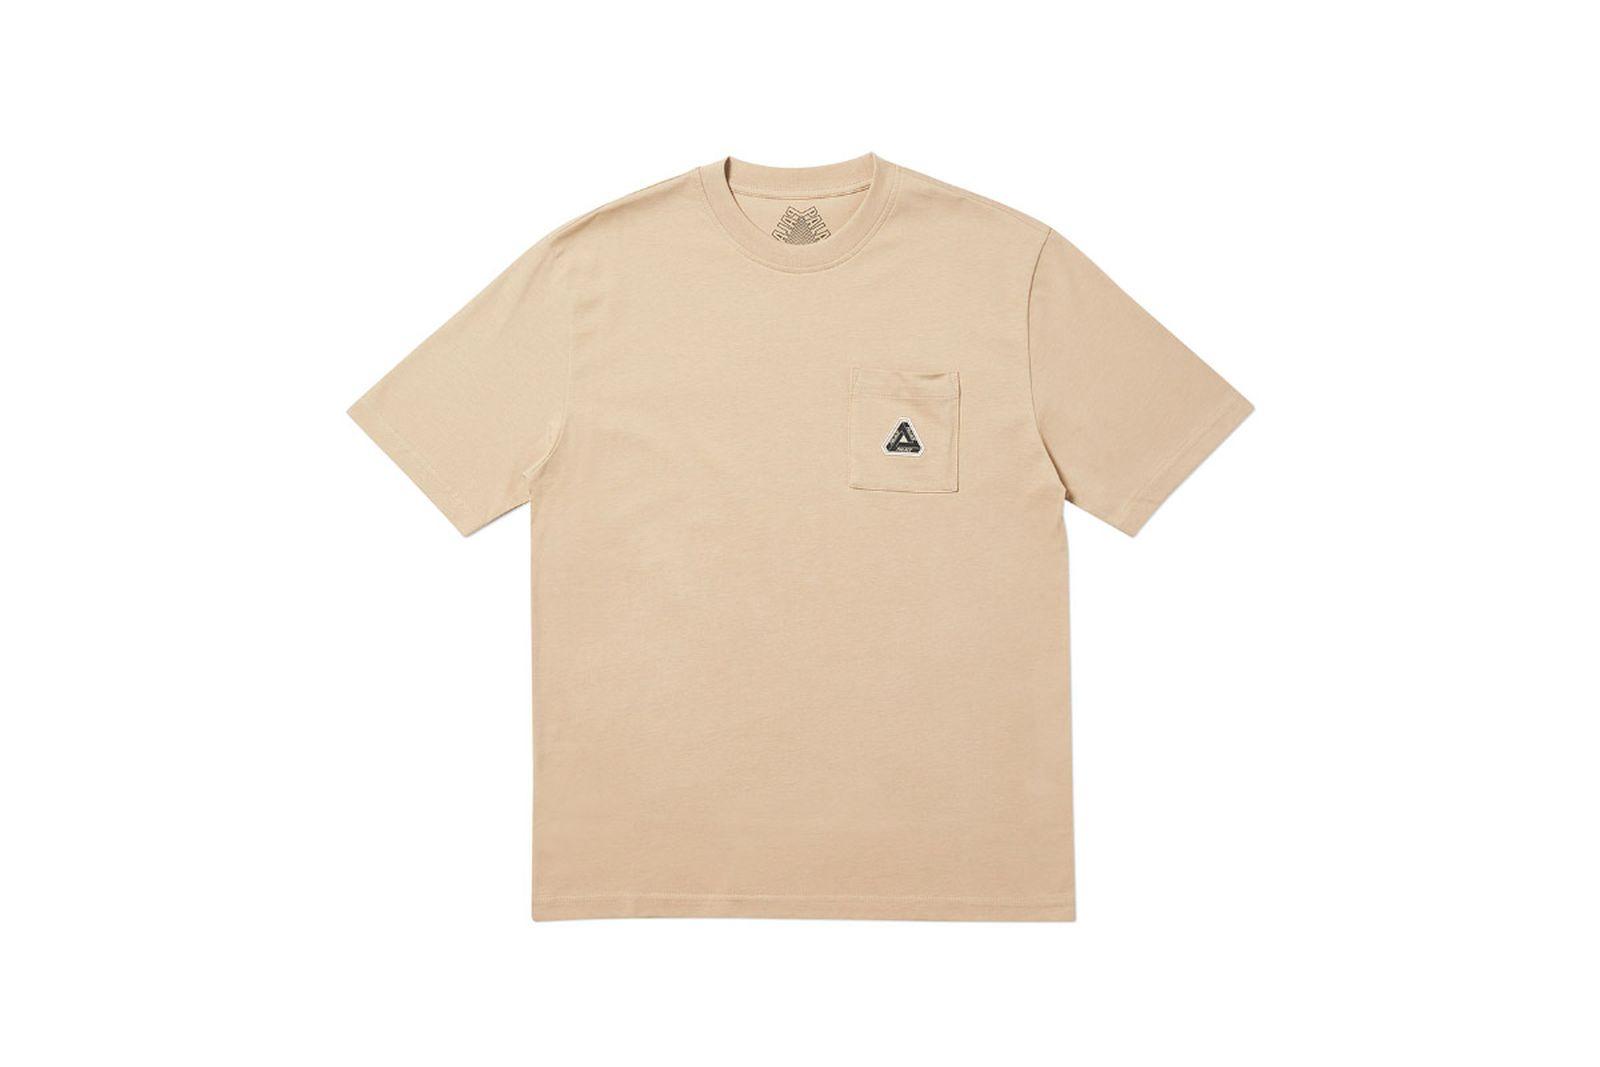 Palace 2019 Autumn T Shirt Pocket T sesame